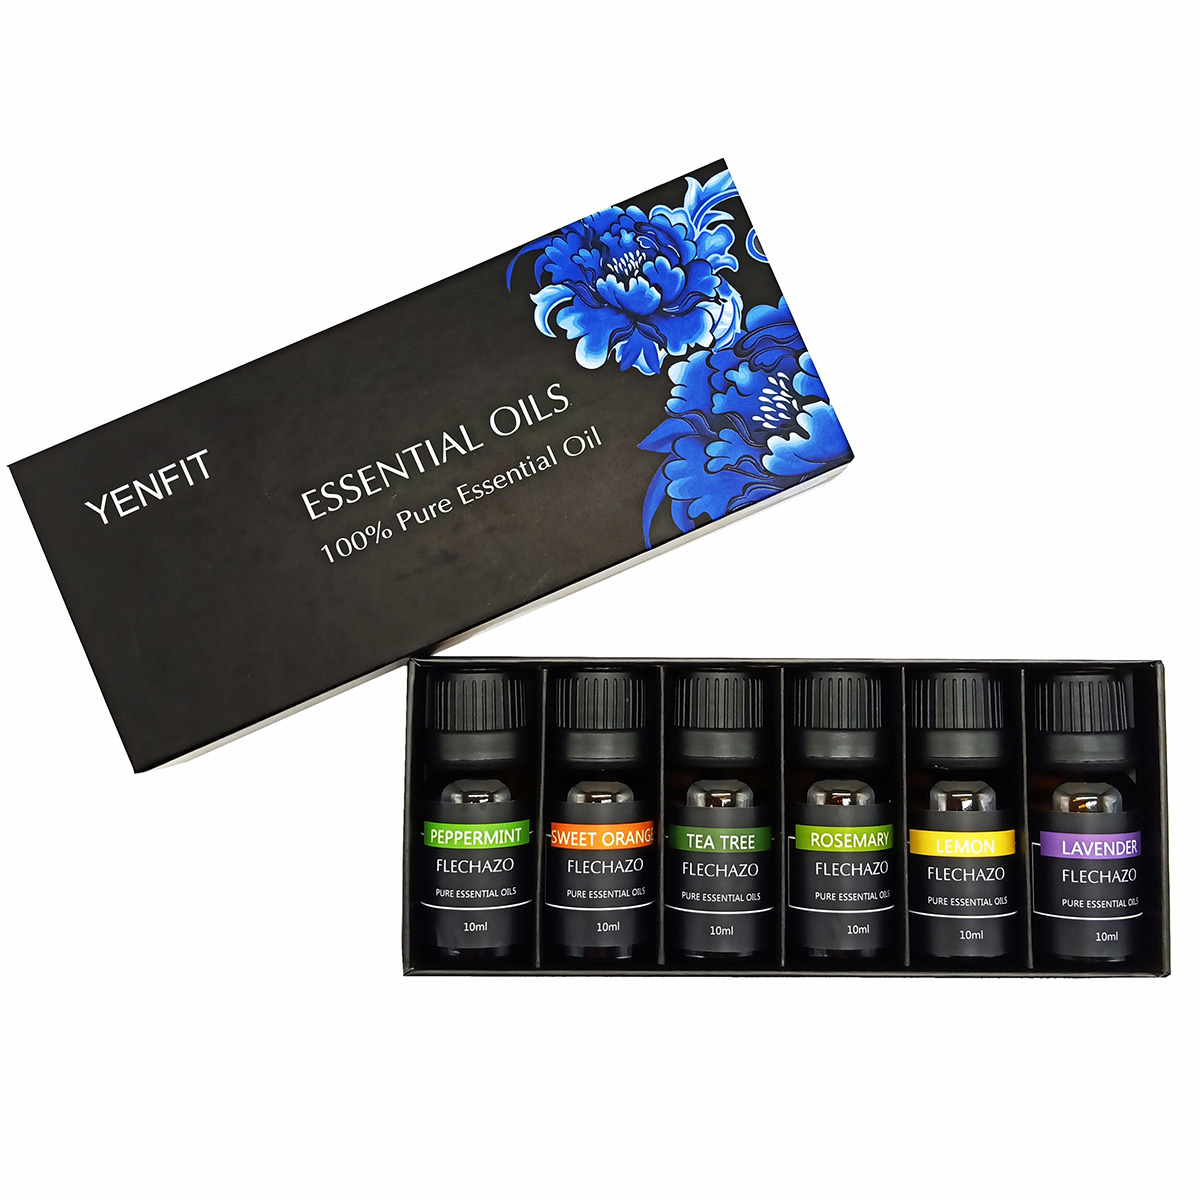 Hot Sale 100% pure therapeutic grade aroma oil 10 ml lavender essential oil set gift box 10ml water soluble